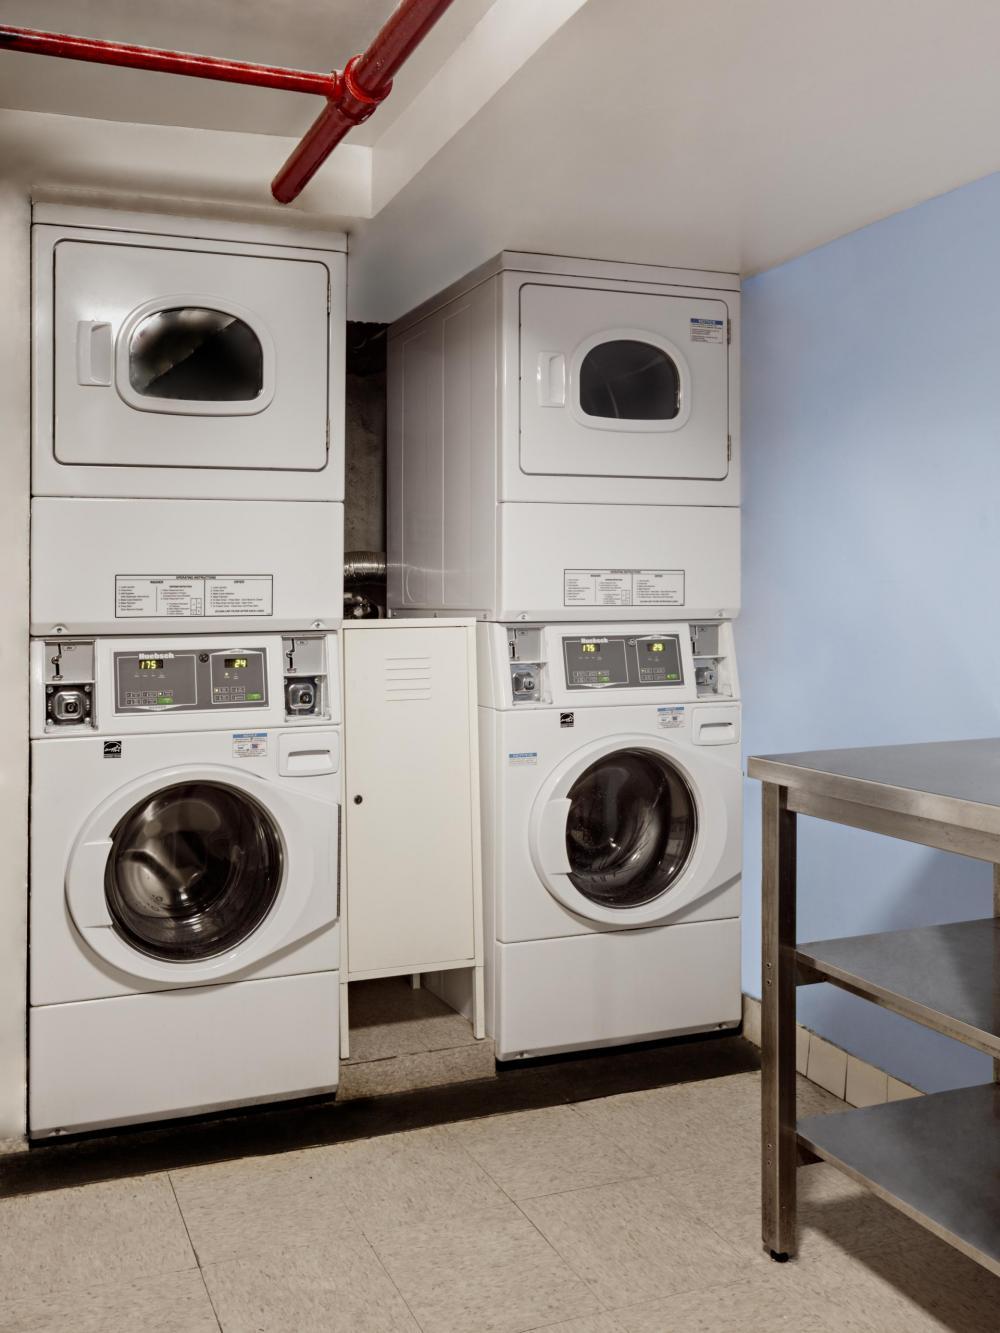 Pesukone ja kuivausrumpu ovat 1 dollari per kuorma